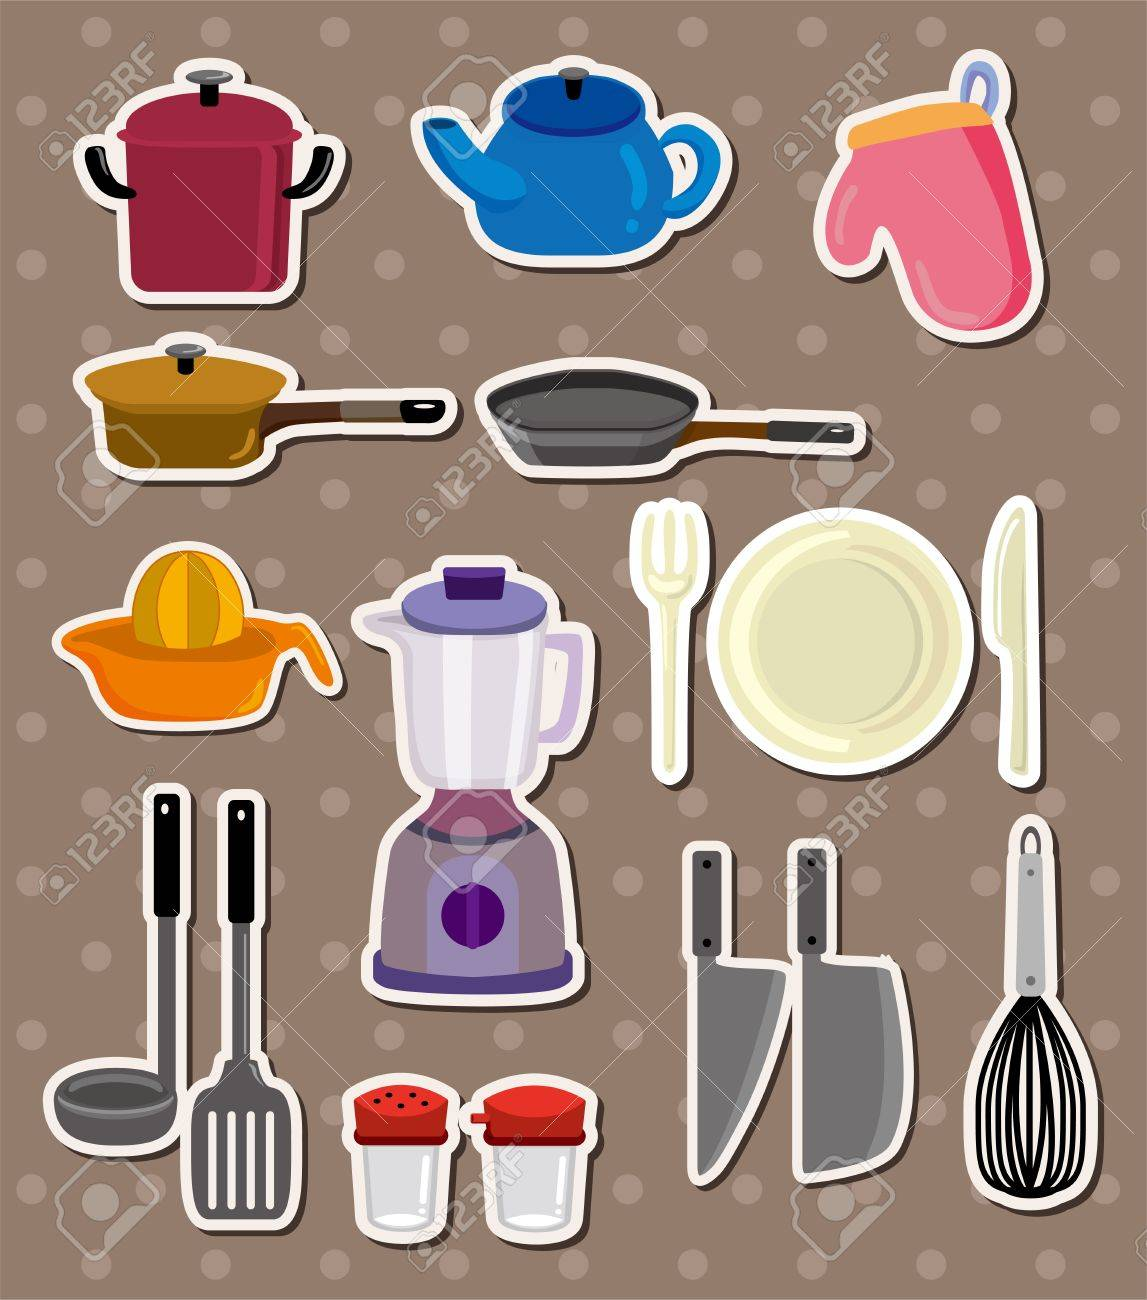 kitchen stickers Stock Vector - 13122067